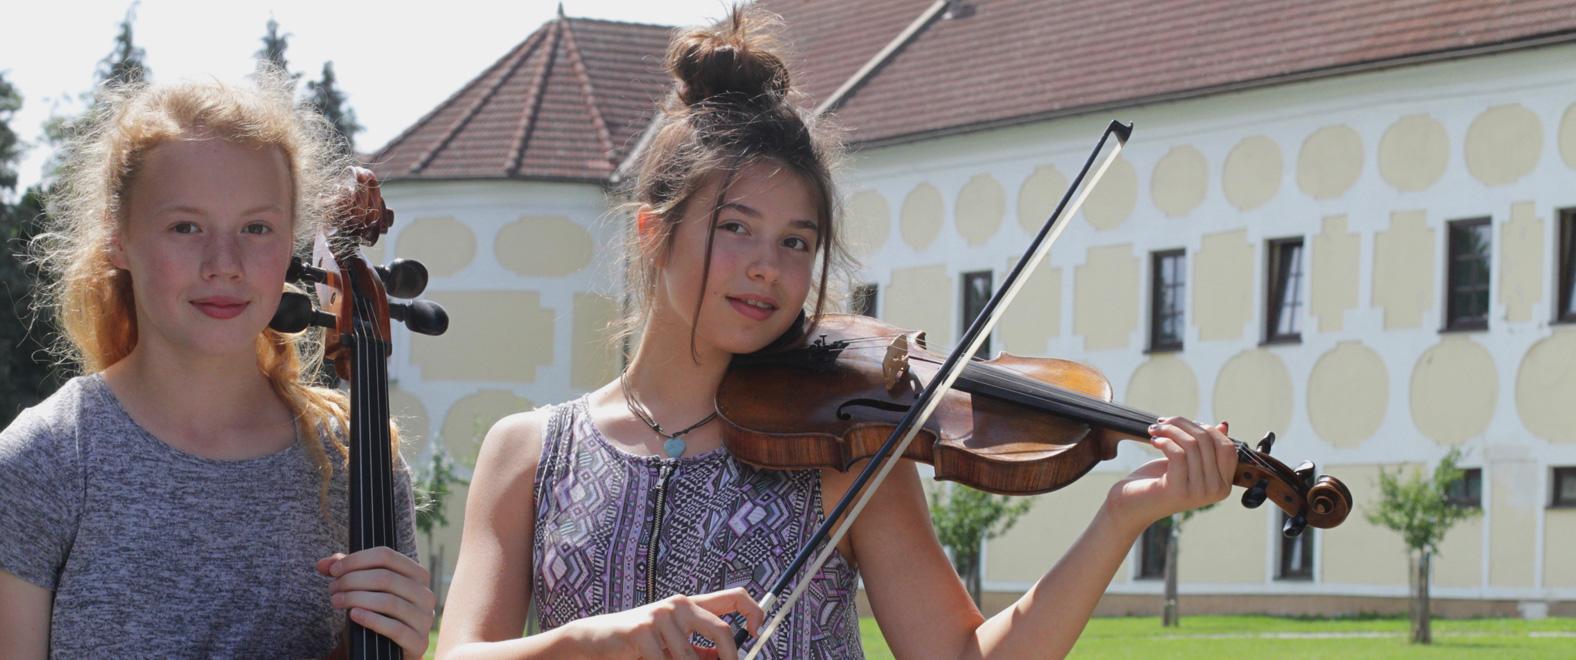 Musikwoche Edelhof 2019